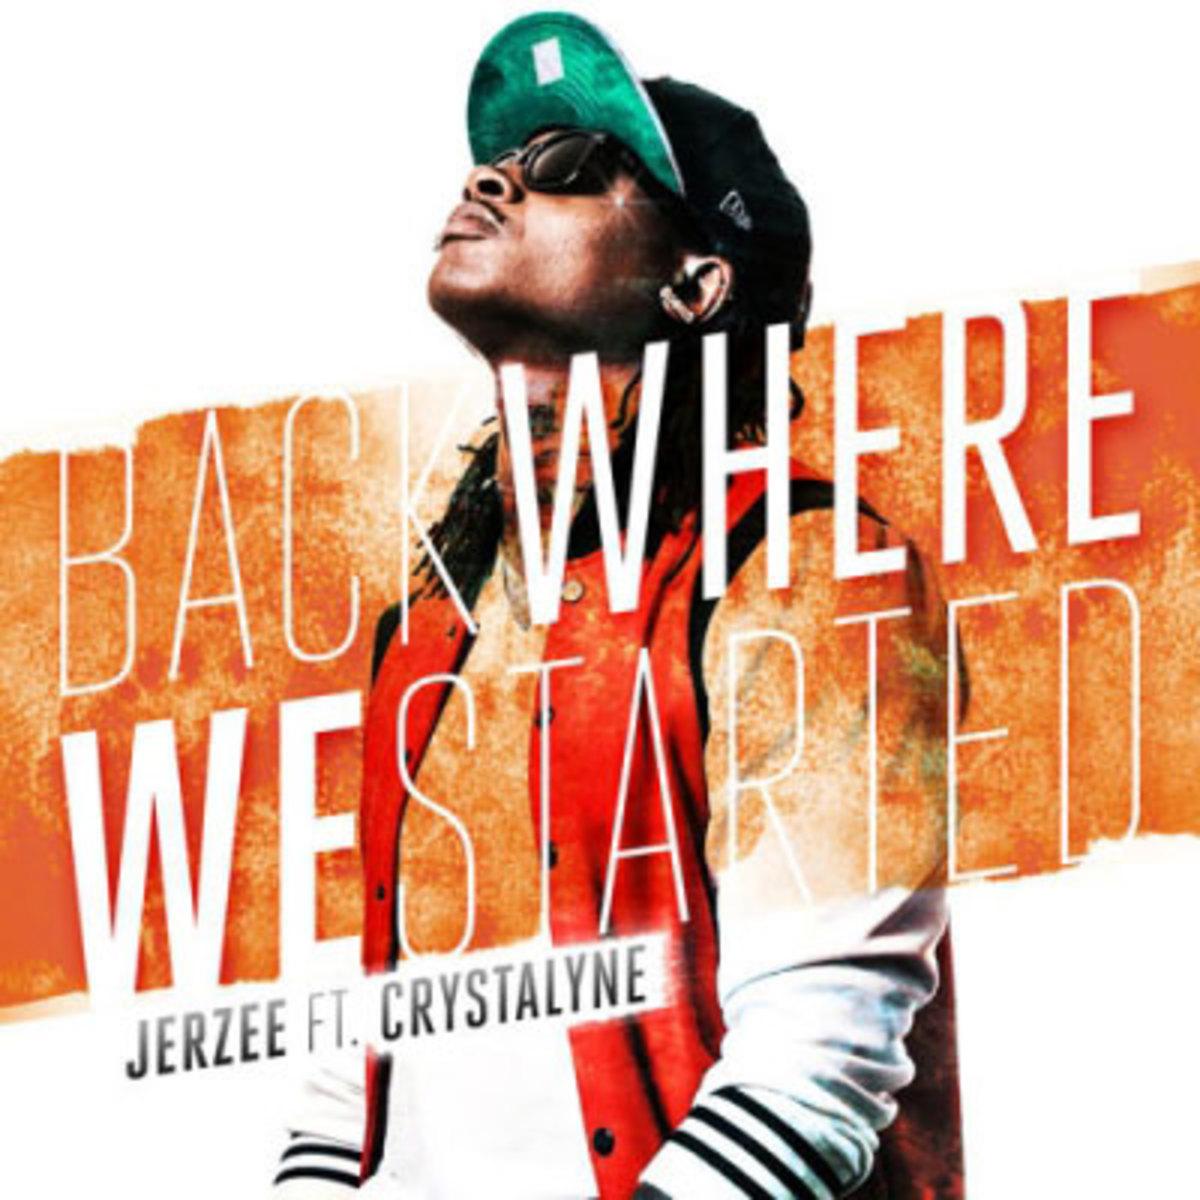 jerzee-back-where-we-started.jpg